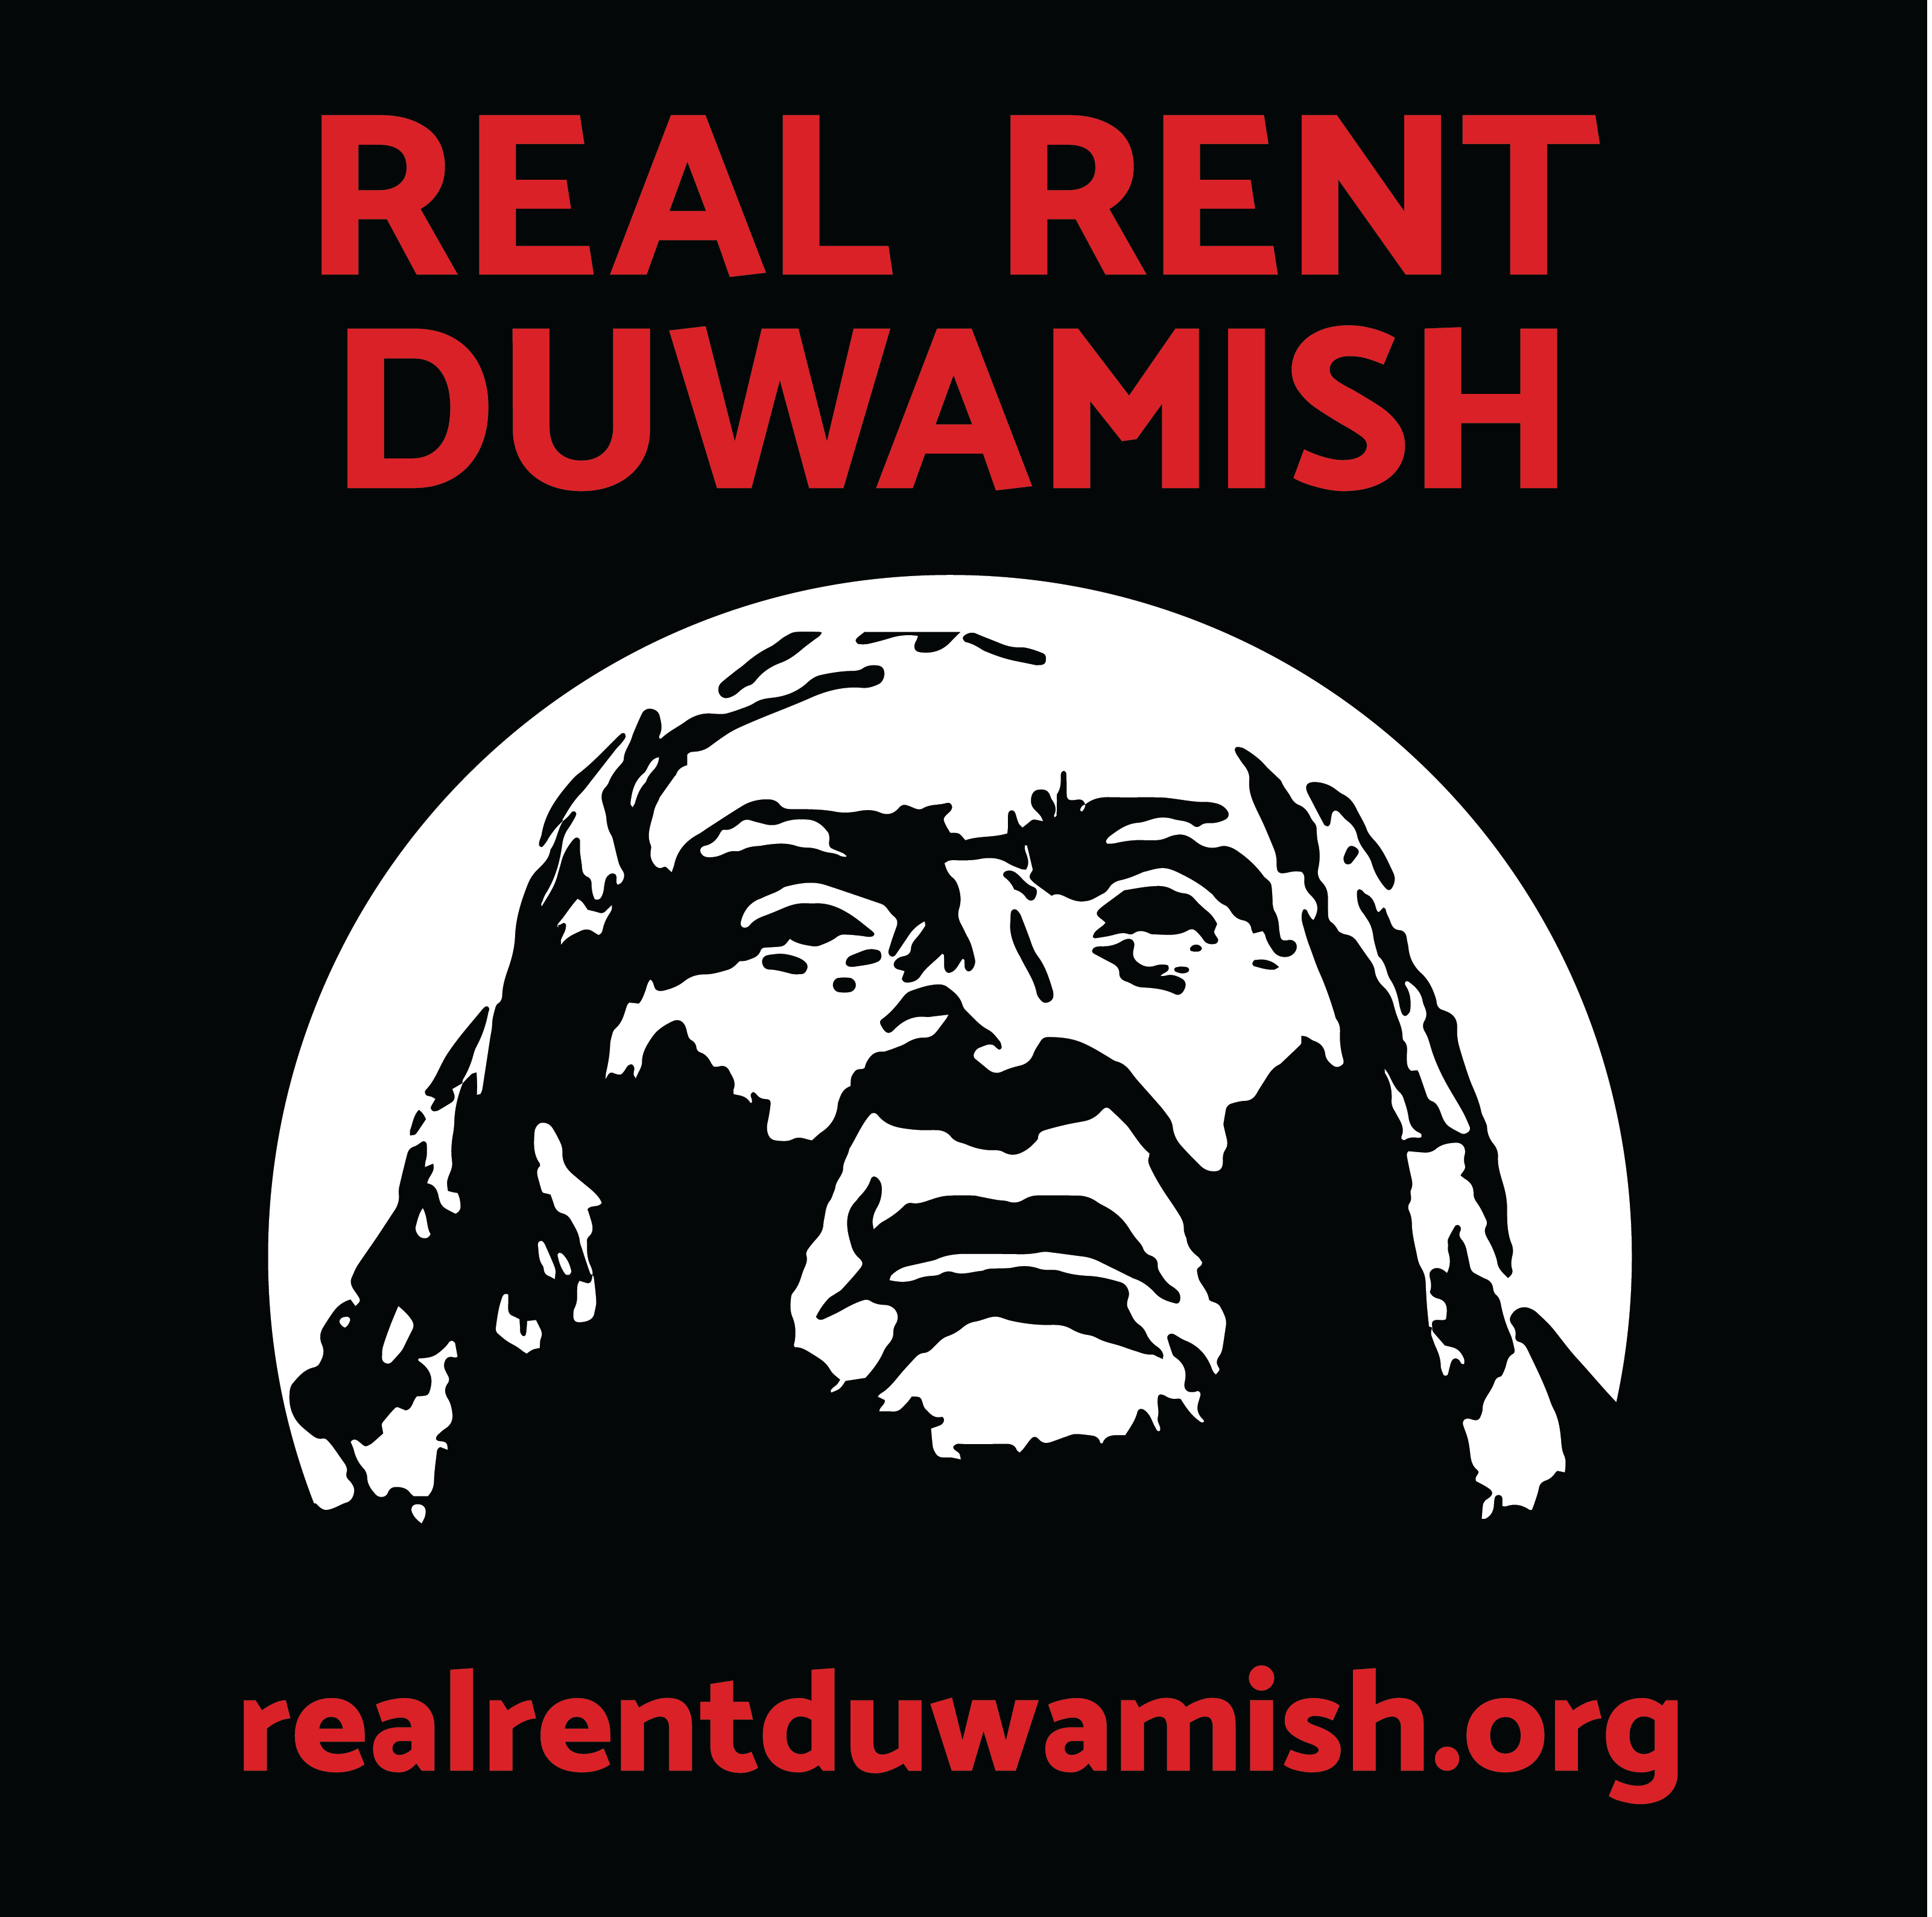 Real Rent Duwamish social media post